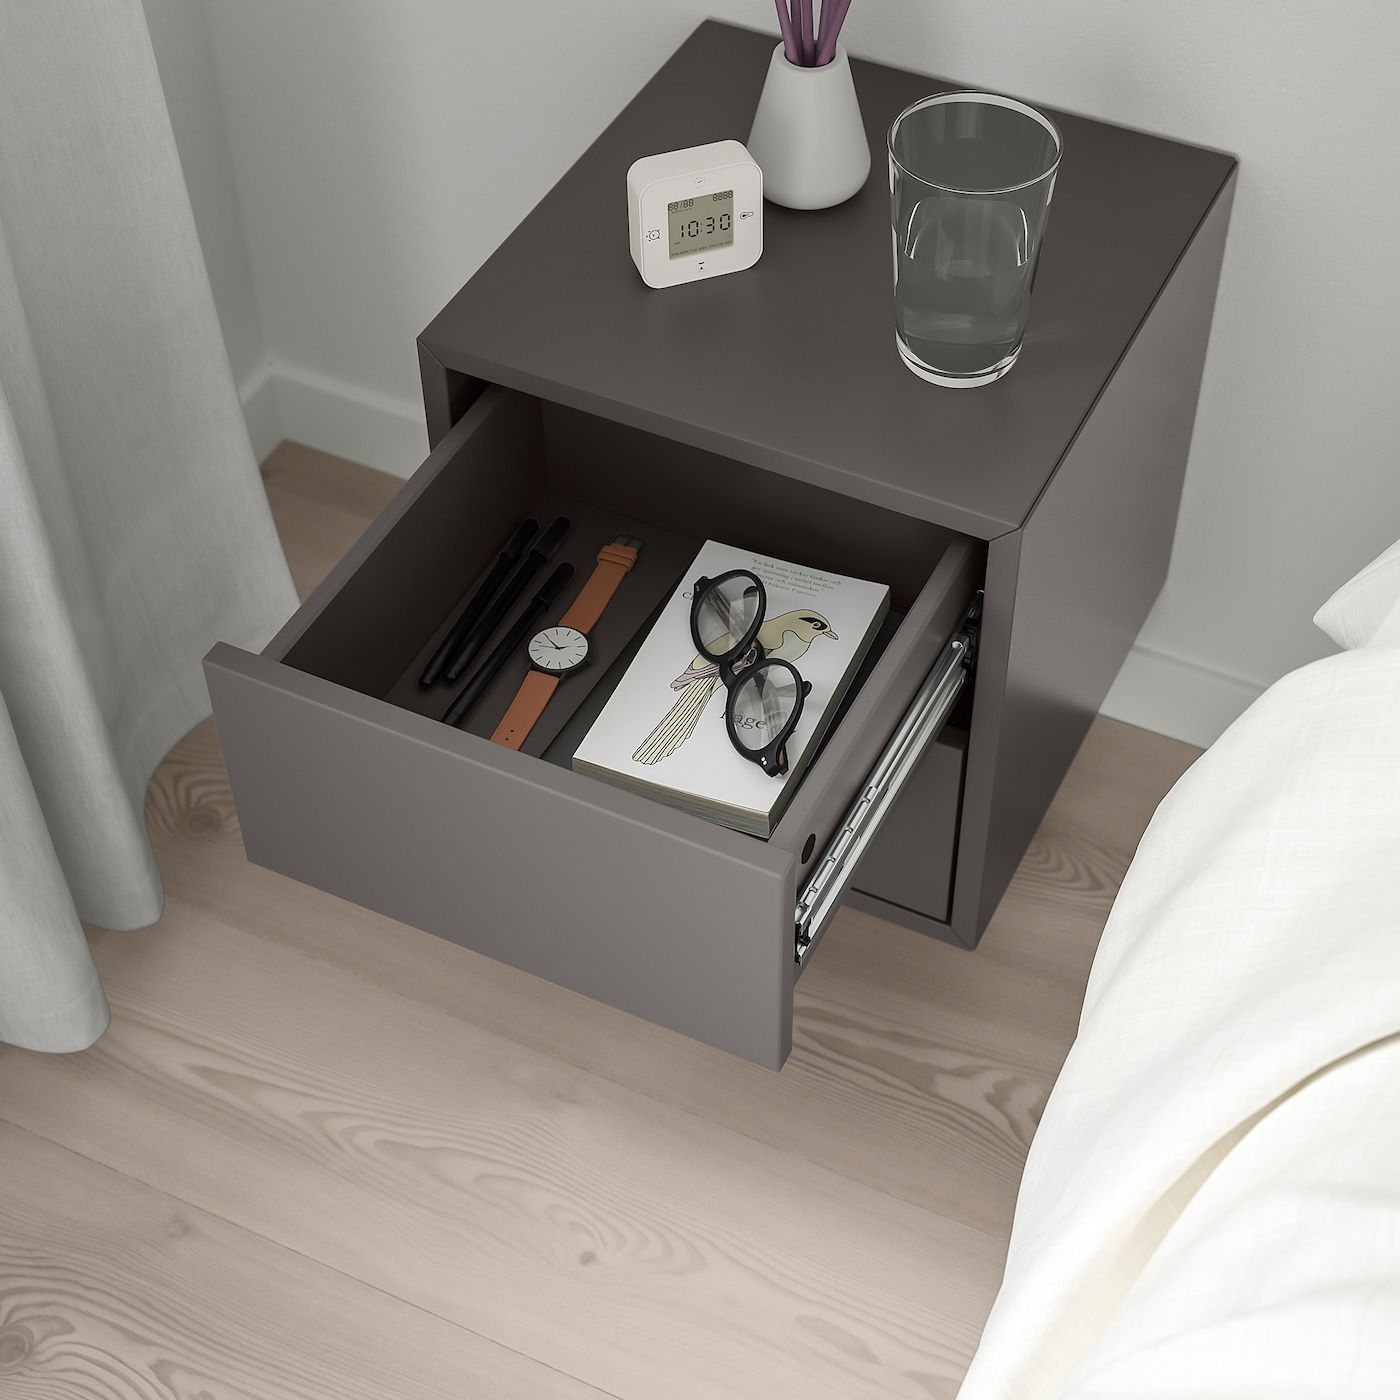 Eket Wandschrank Mit 2 Schubladen Dunkelgrau Ikea Osterreich In 2020 Wall Cabinet Eket Ikea